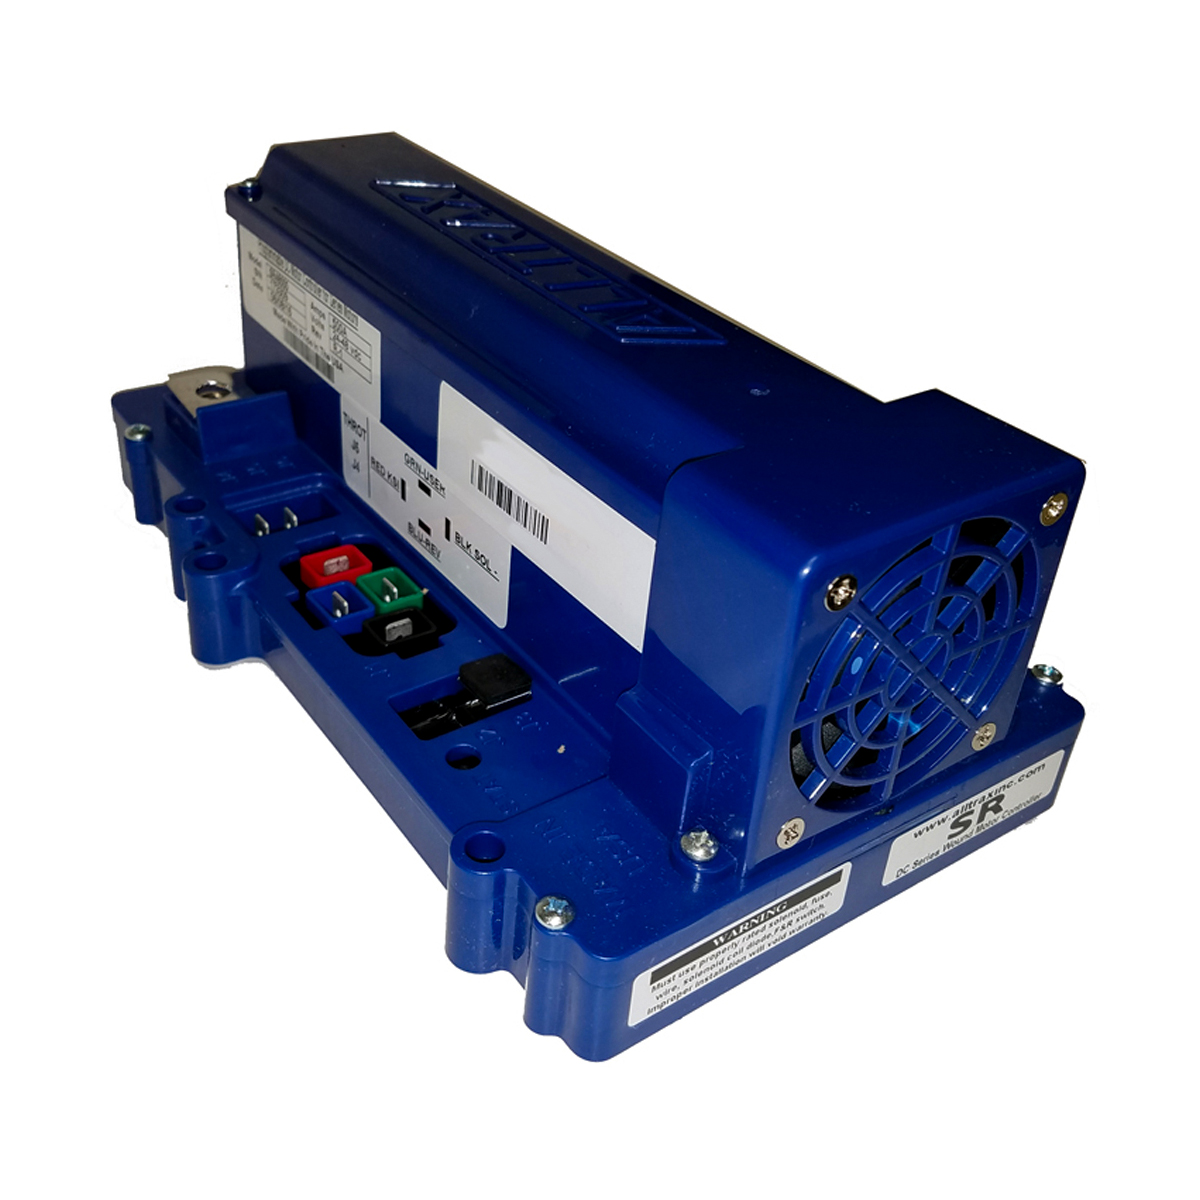 Alltrax 500 Amp Series Speed Controller for Club Car, EZGO & Yamaha